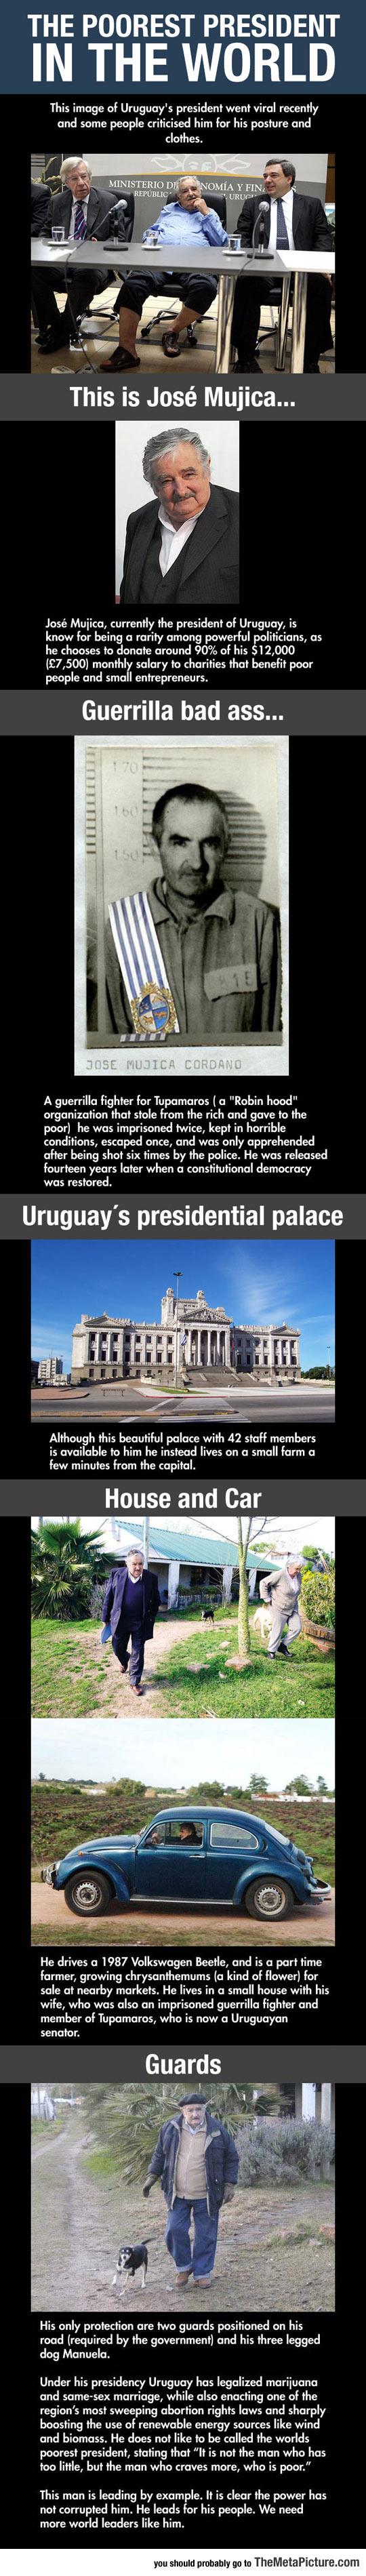 Uruguay-President-Mujica-poor-humble